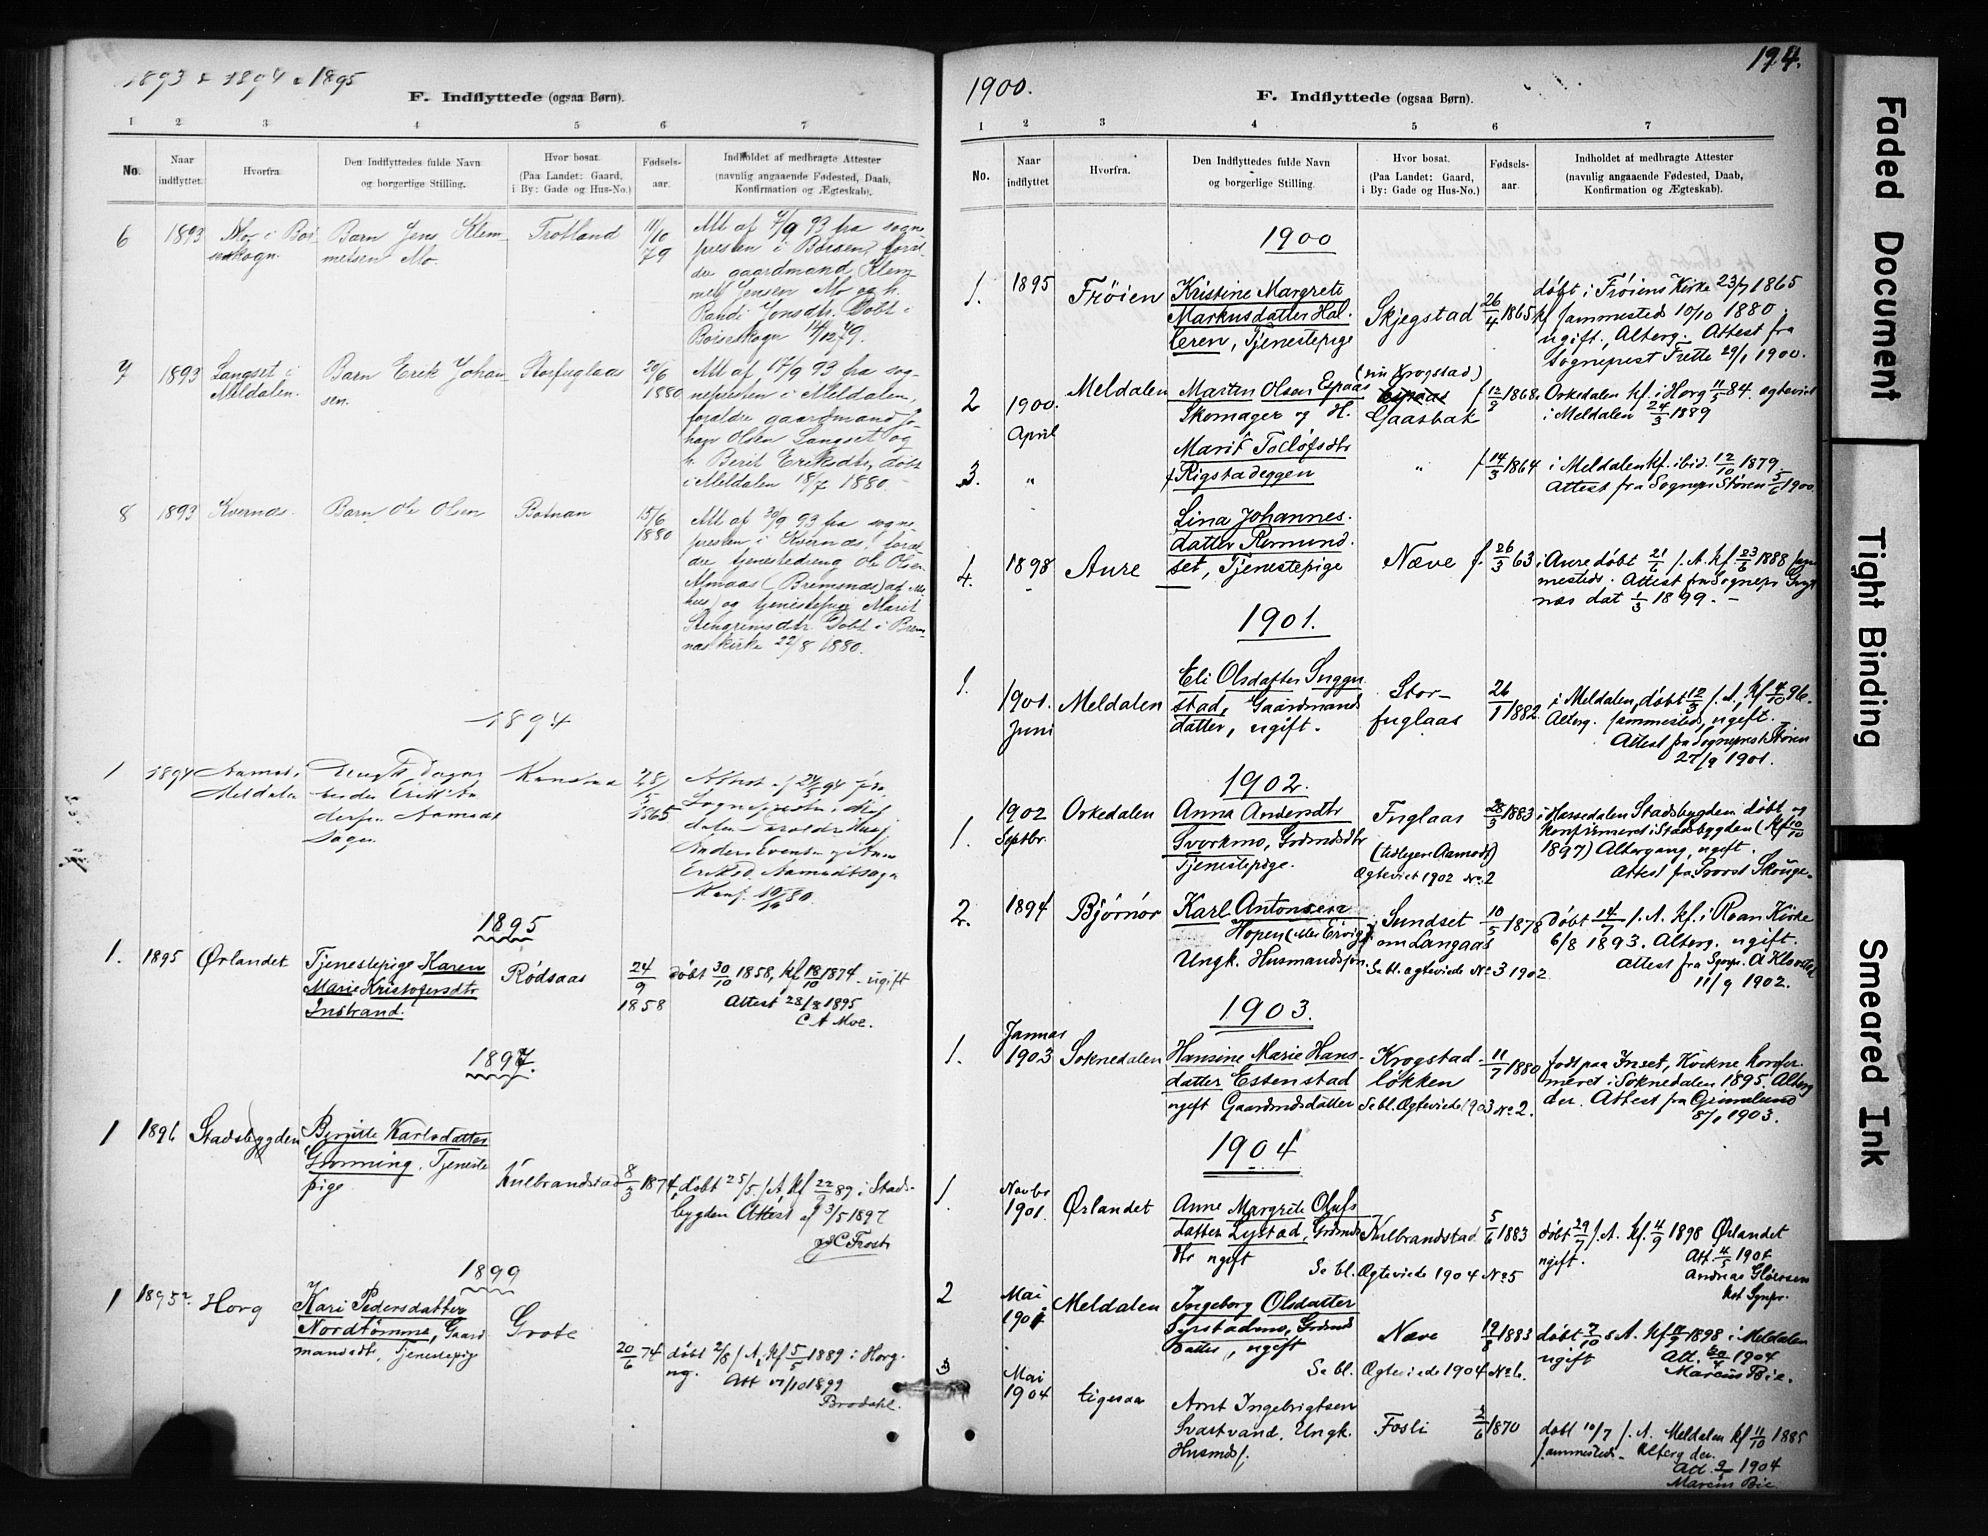 SAT, Ministerialprotokoller, klokkerbøker og fødselsregistre - Sør-Trøndelag, 694/L1127: Parish register (official) no. 694A01, 1887-1905, p. 194